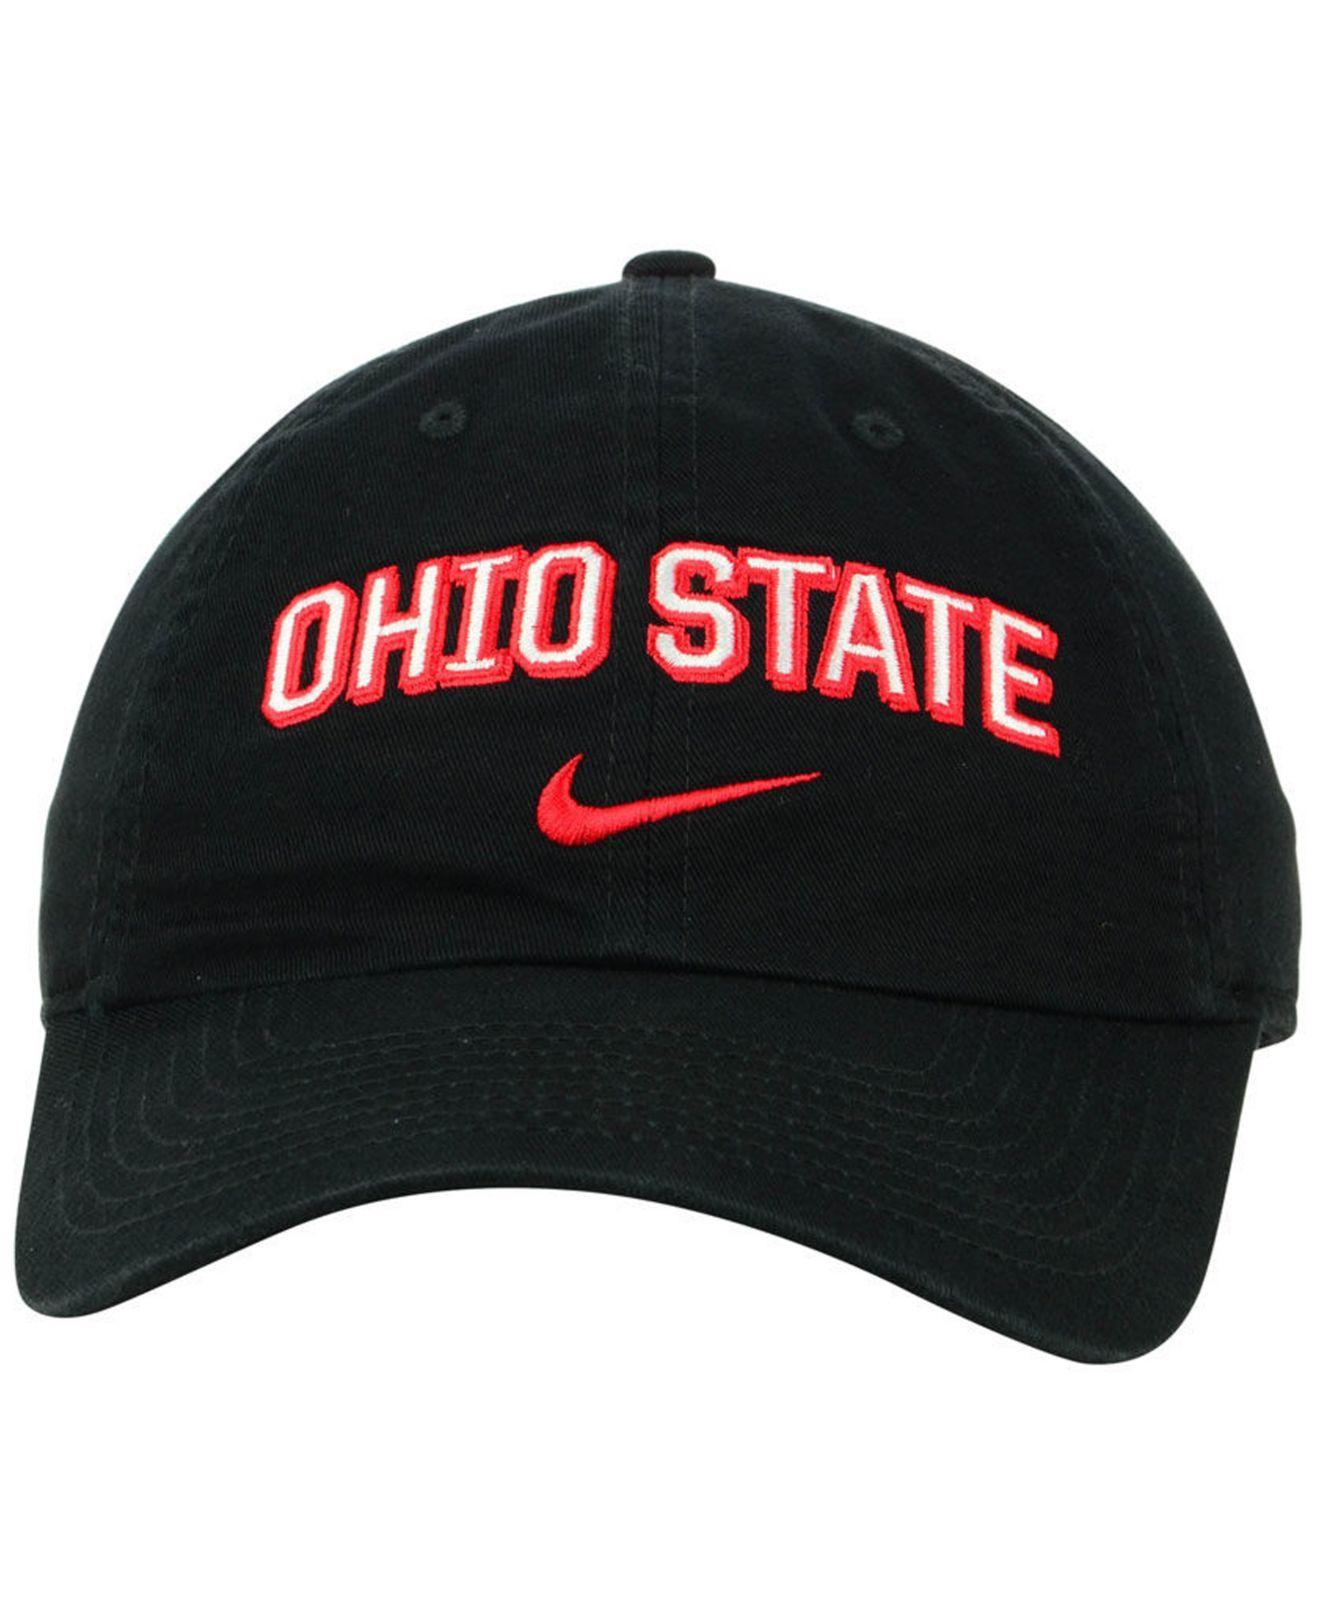 sports shoes bf2e7 acb13 Nike - Black Ohio State Buckeyes H86 Wordmark Swoosh Cap for Men - Lyst.  View fullscreen